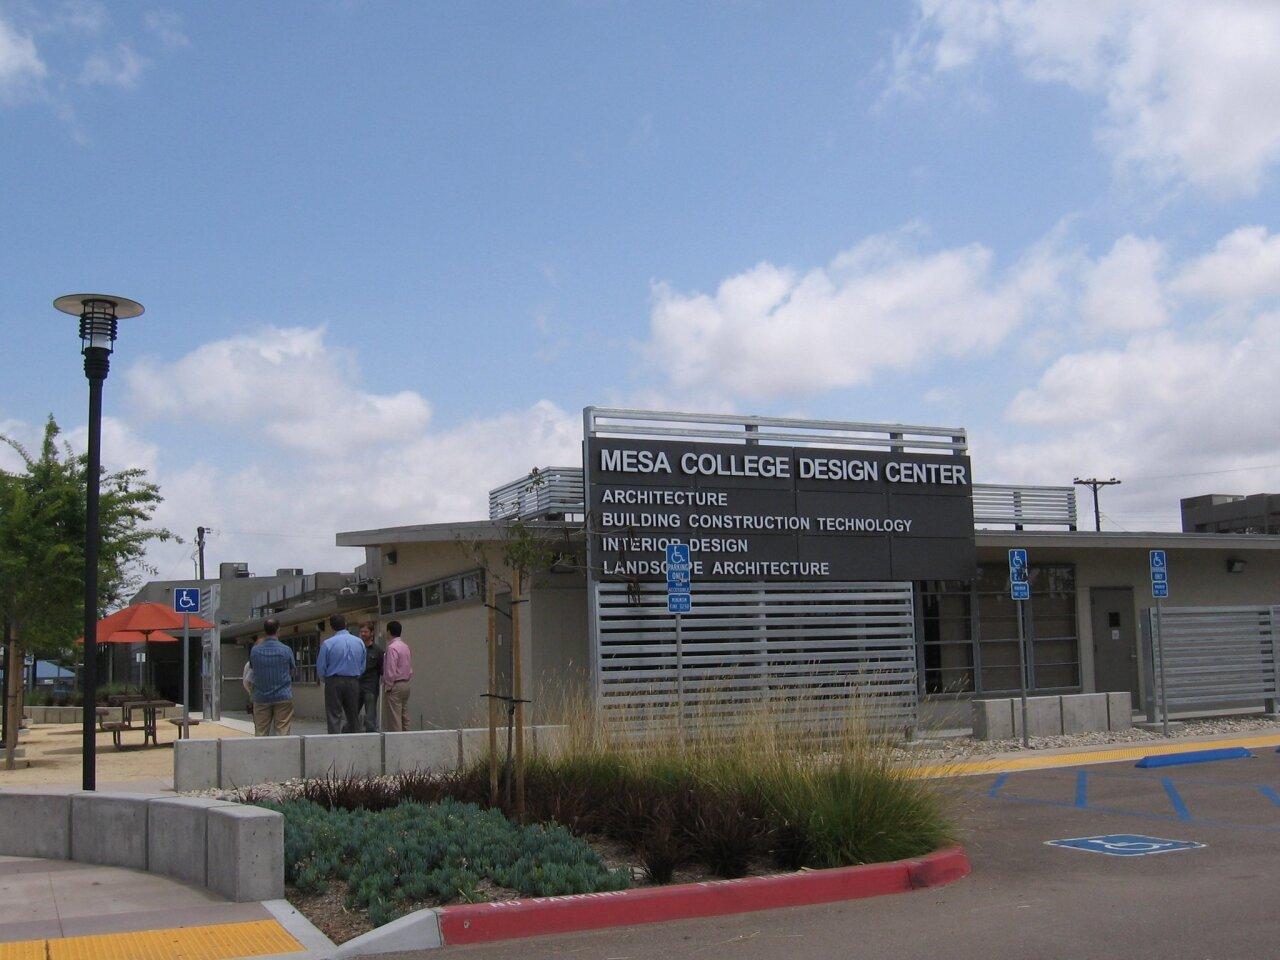 Mesa College Design Center